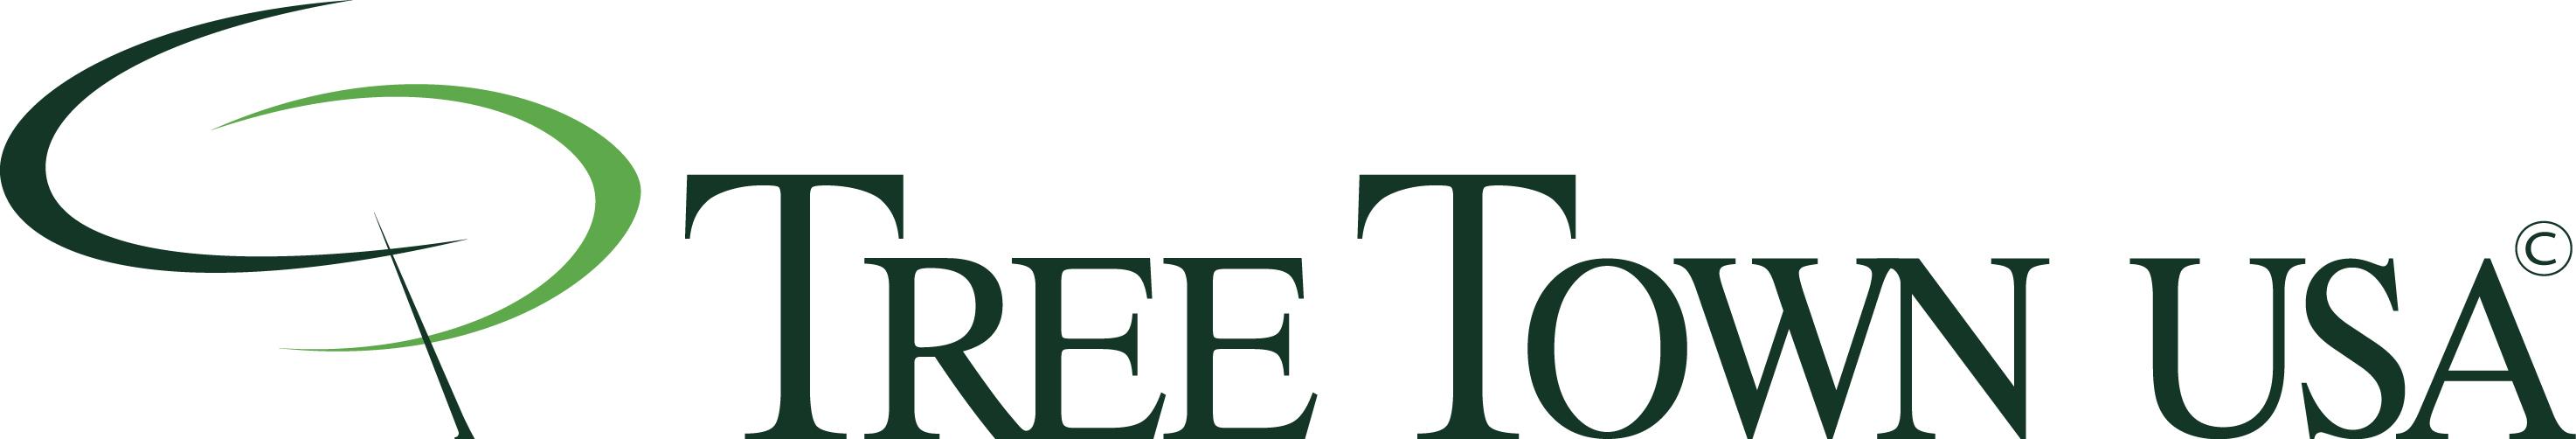 Daly Swartz Pr For Treetown Usa And Village Nurseries Jeffrey 949 470 0075